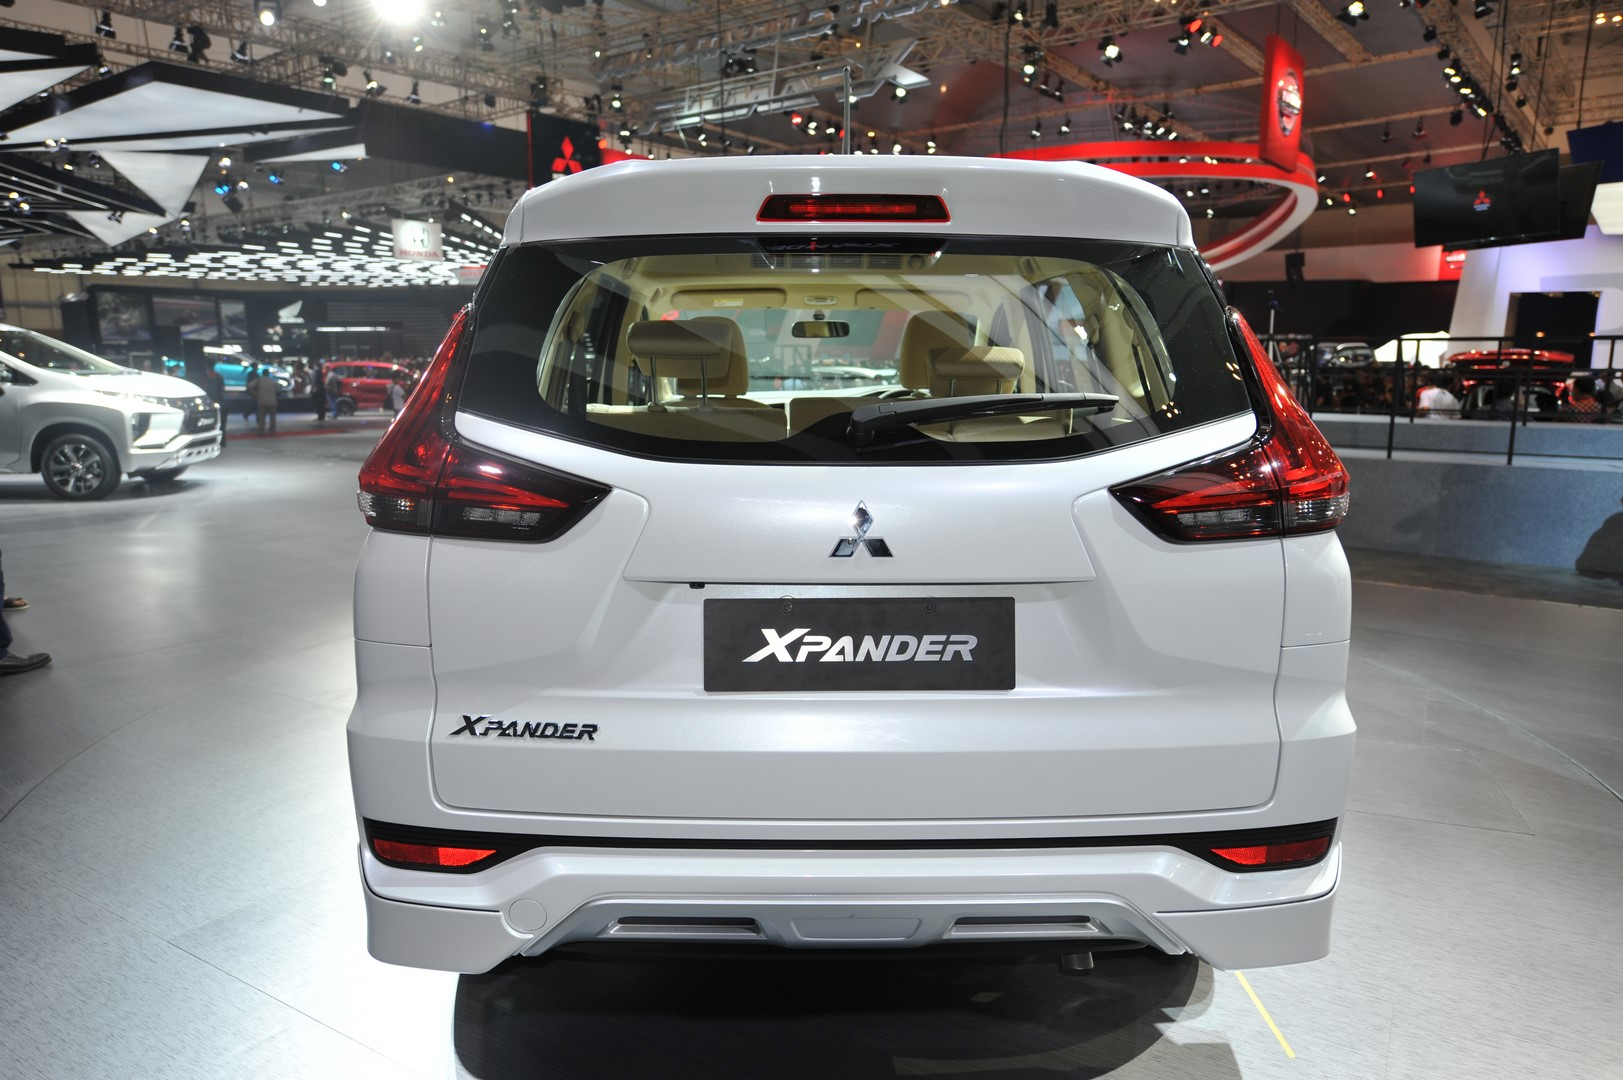 GIIAS 2017: Mitsubishi Xpander Makes Official Debut